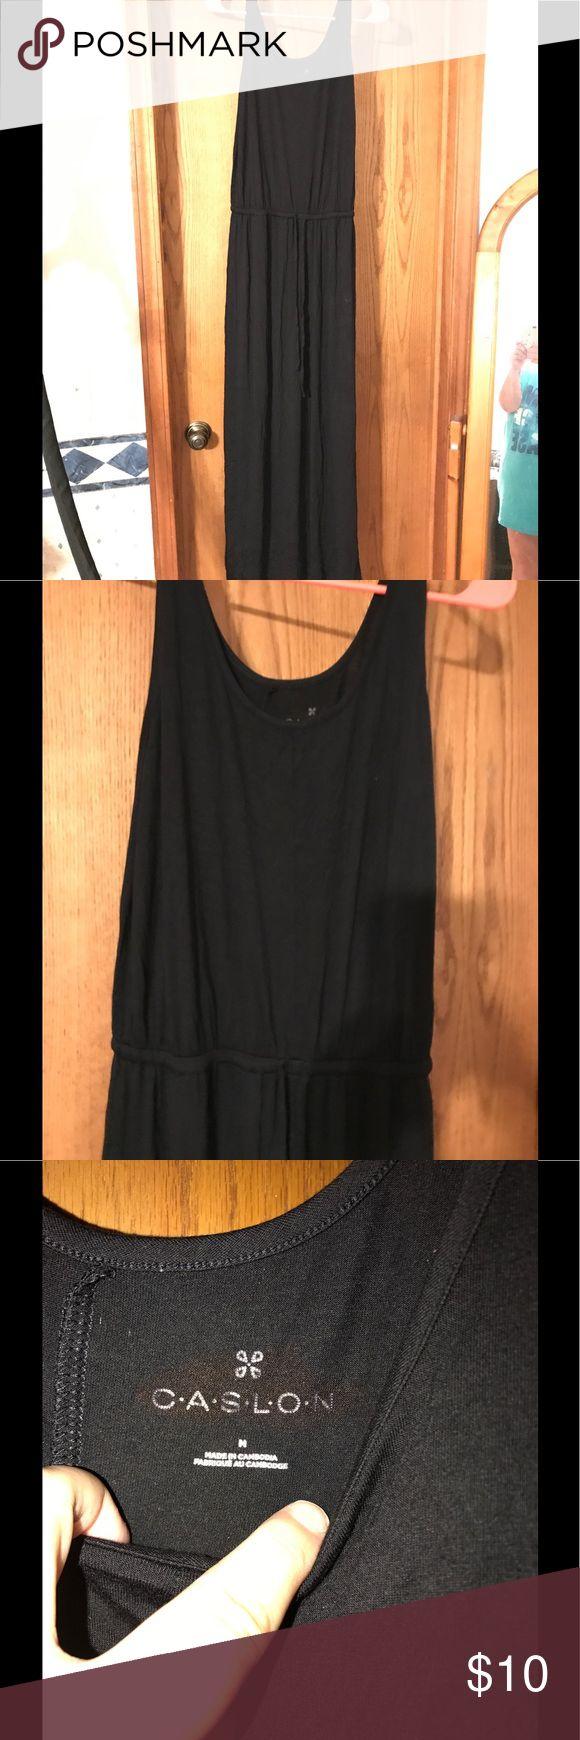 Black tank Maxi Dress Full length black dress, tank  style with a tie at the waist. Caslon Dresses Maxi